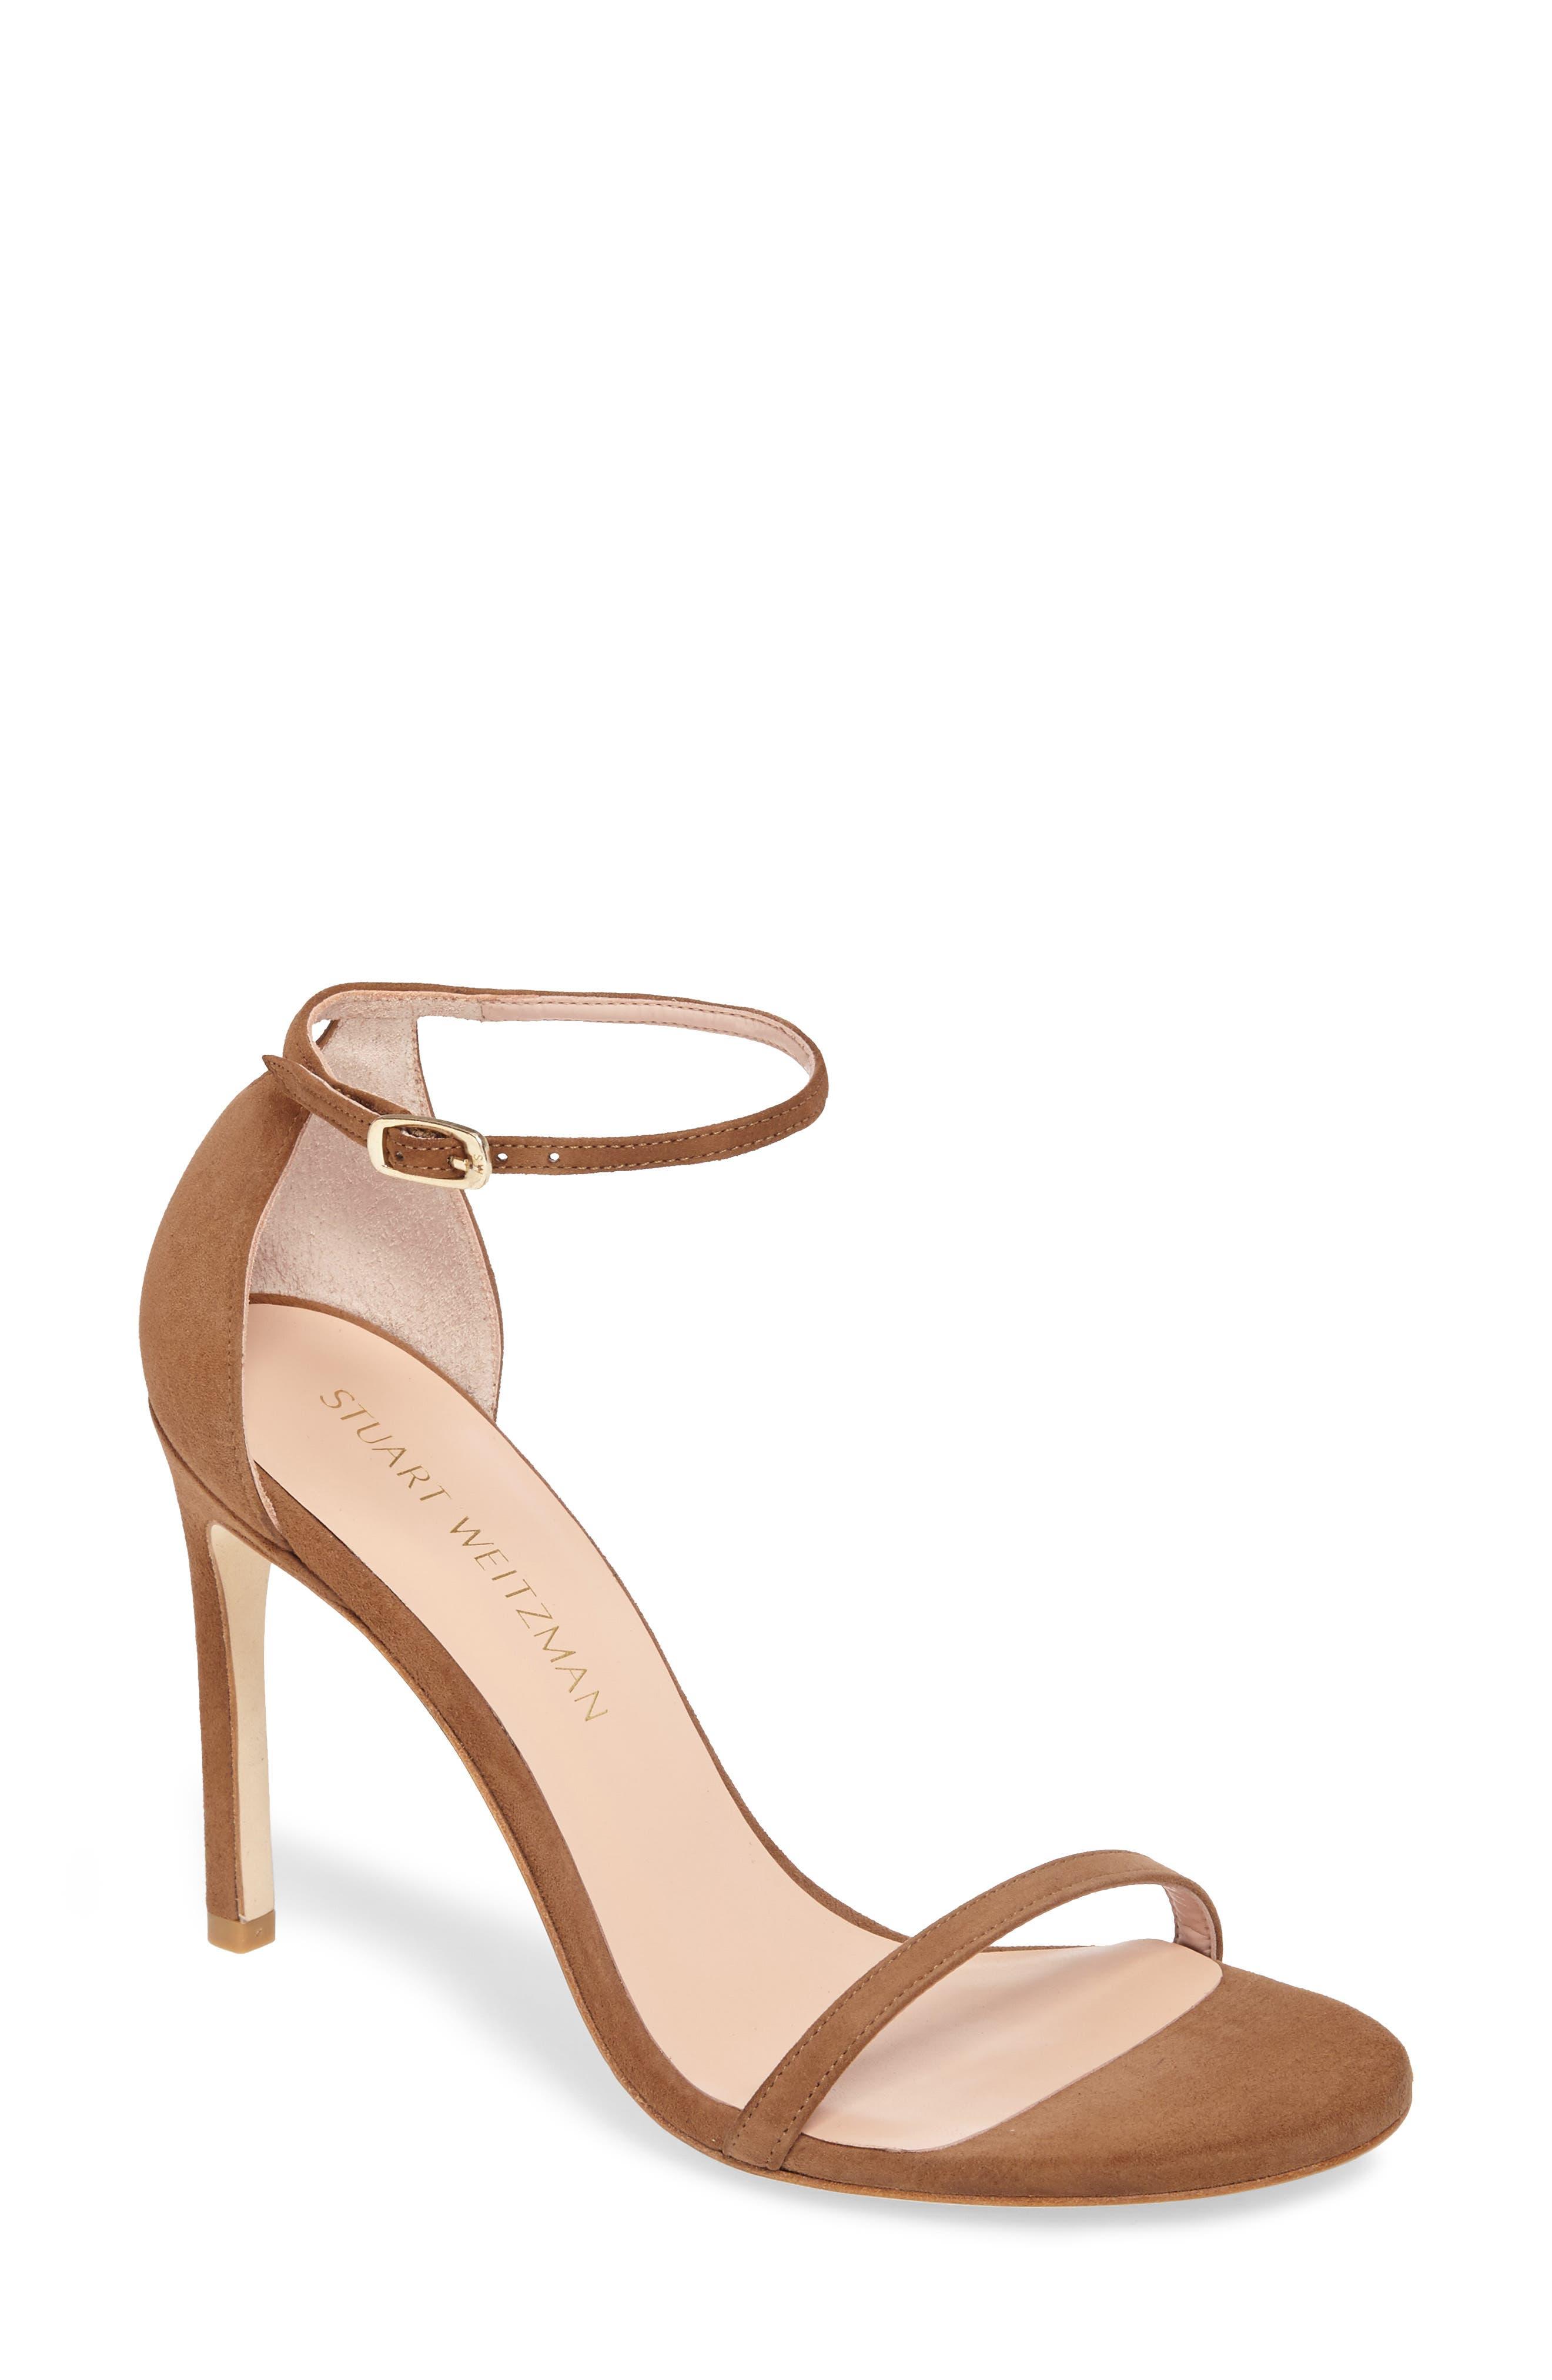 Alternate Image 1 Selected - Stuart Weitzman Nudistsong Ankle Strap Sandal (Women)